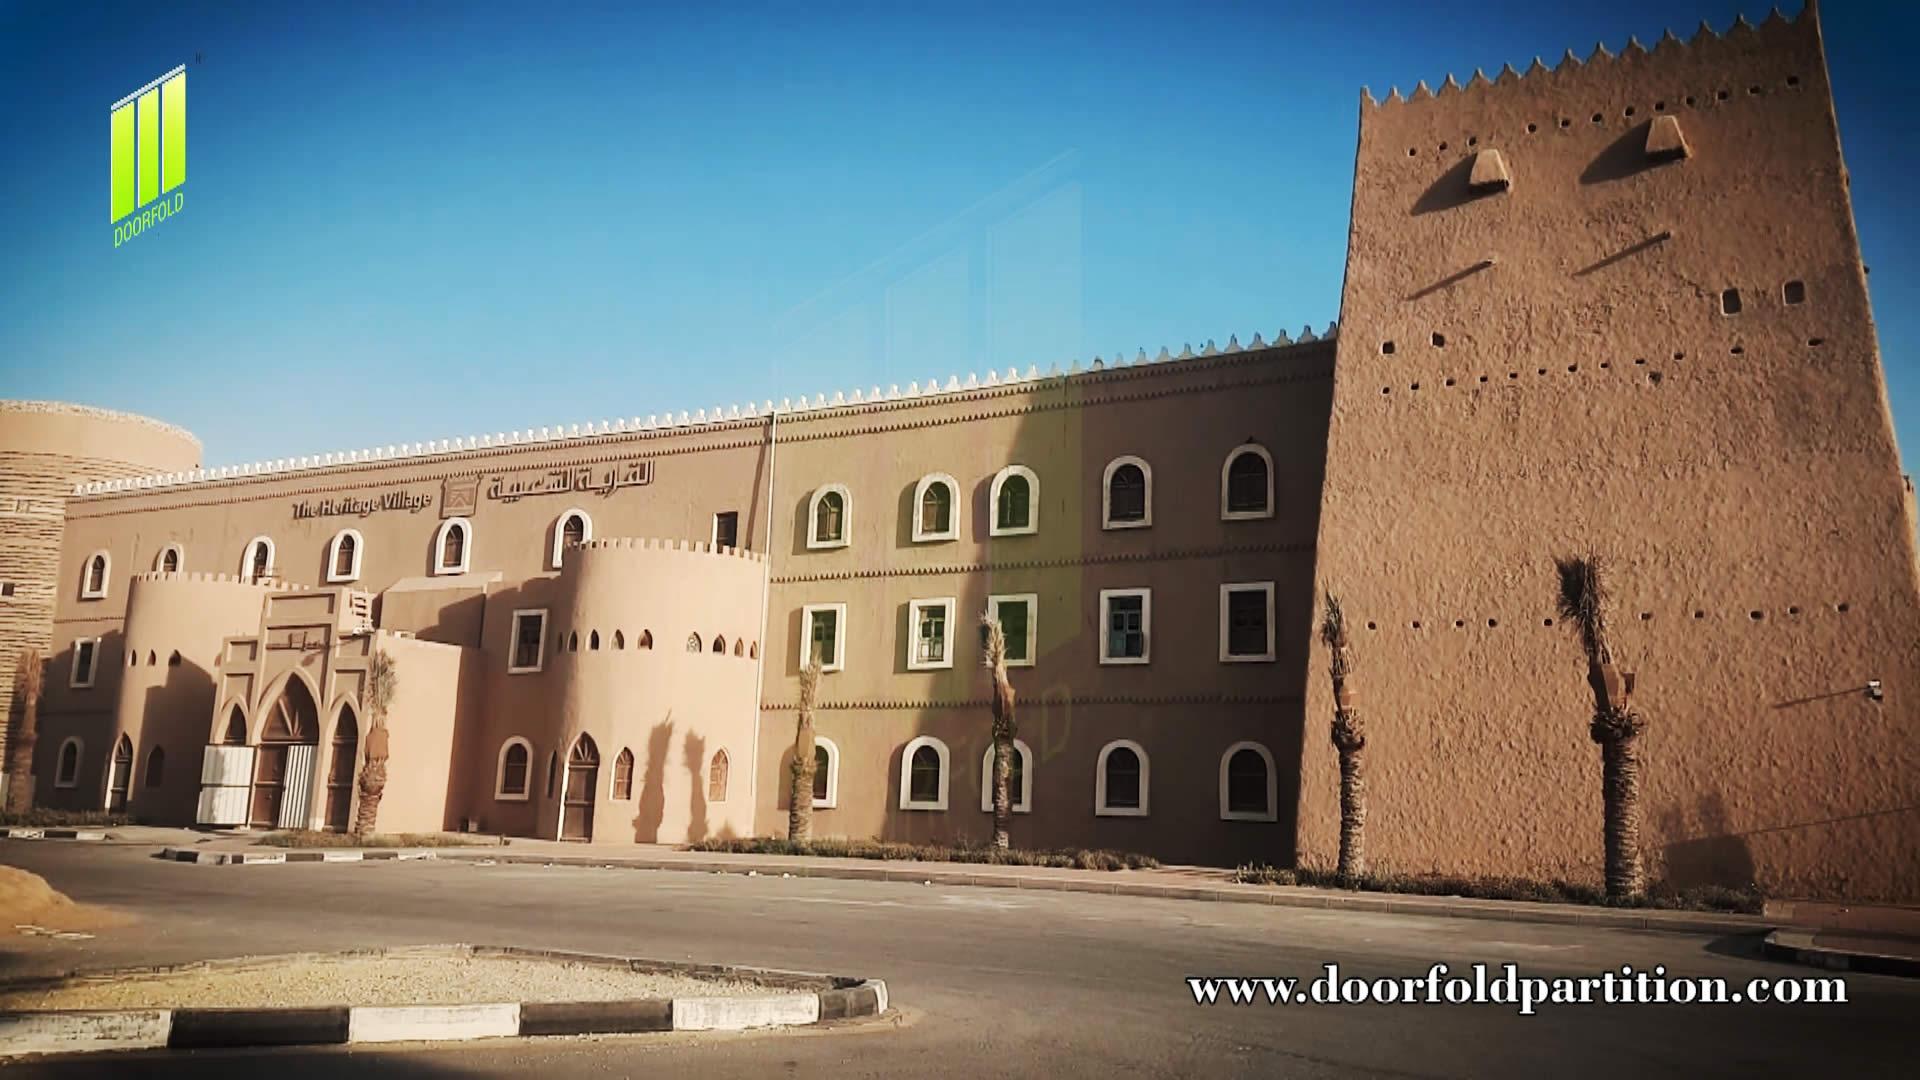 The Heritage Village of Dammam Saudi Arabia